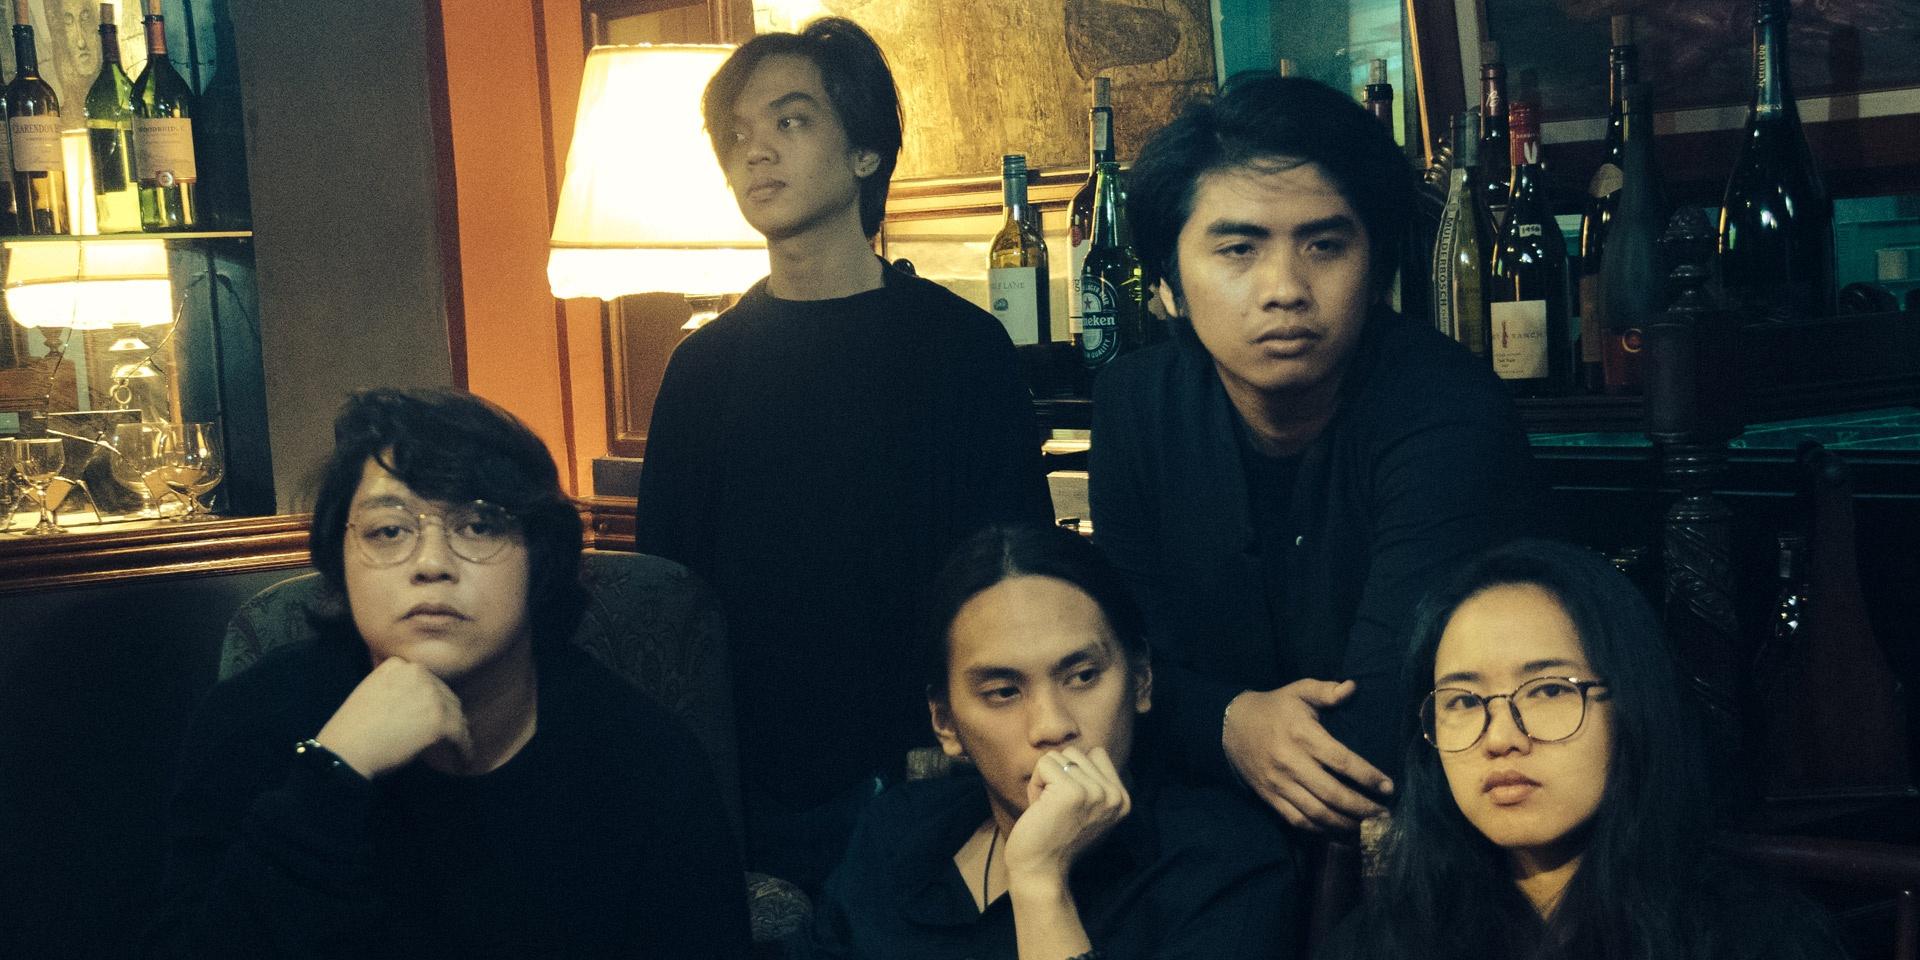 Carousel Casualties reveal new single 'Always' featuring Mic-Mic Manalo & Gani Palabyab – listen